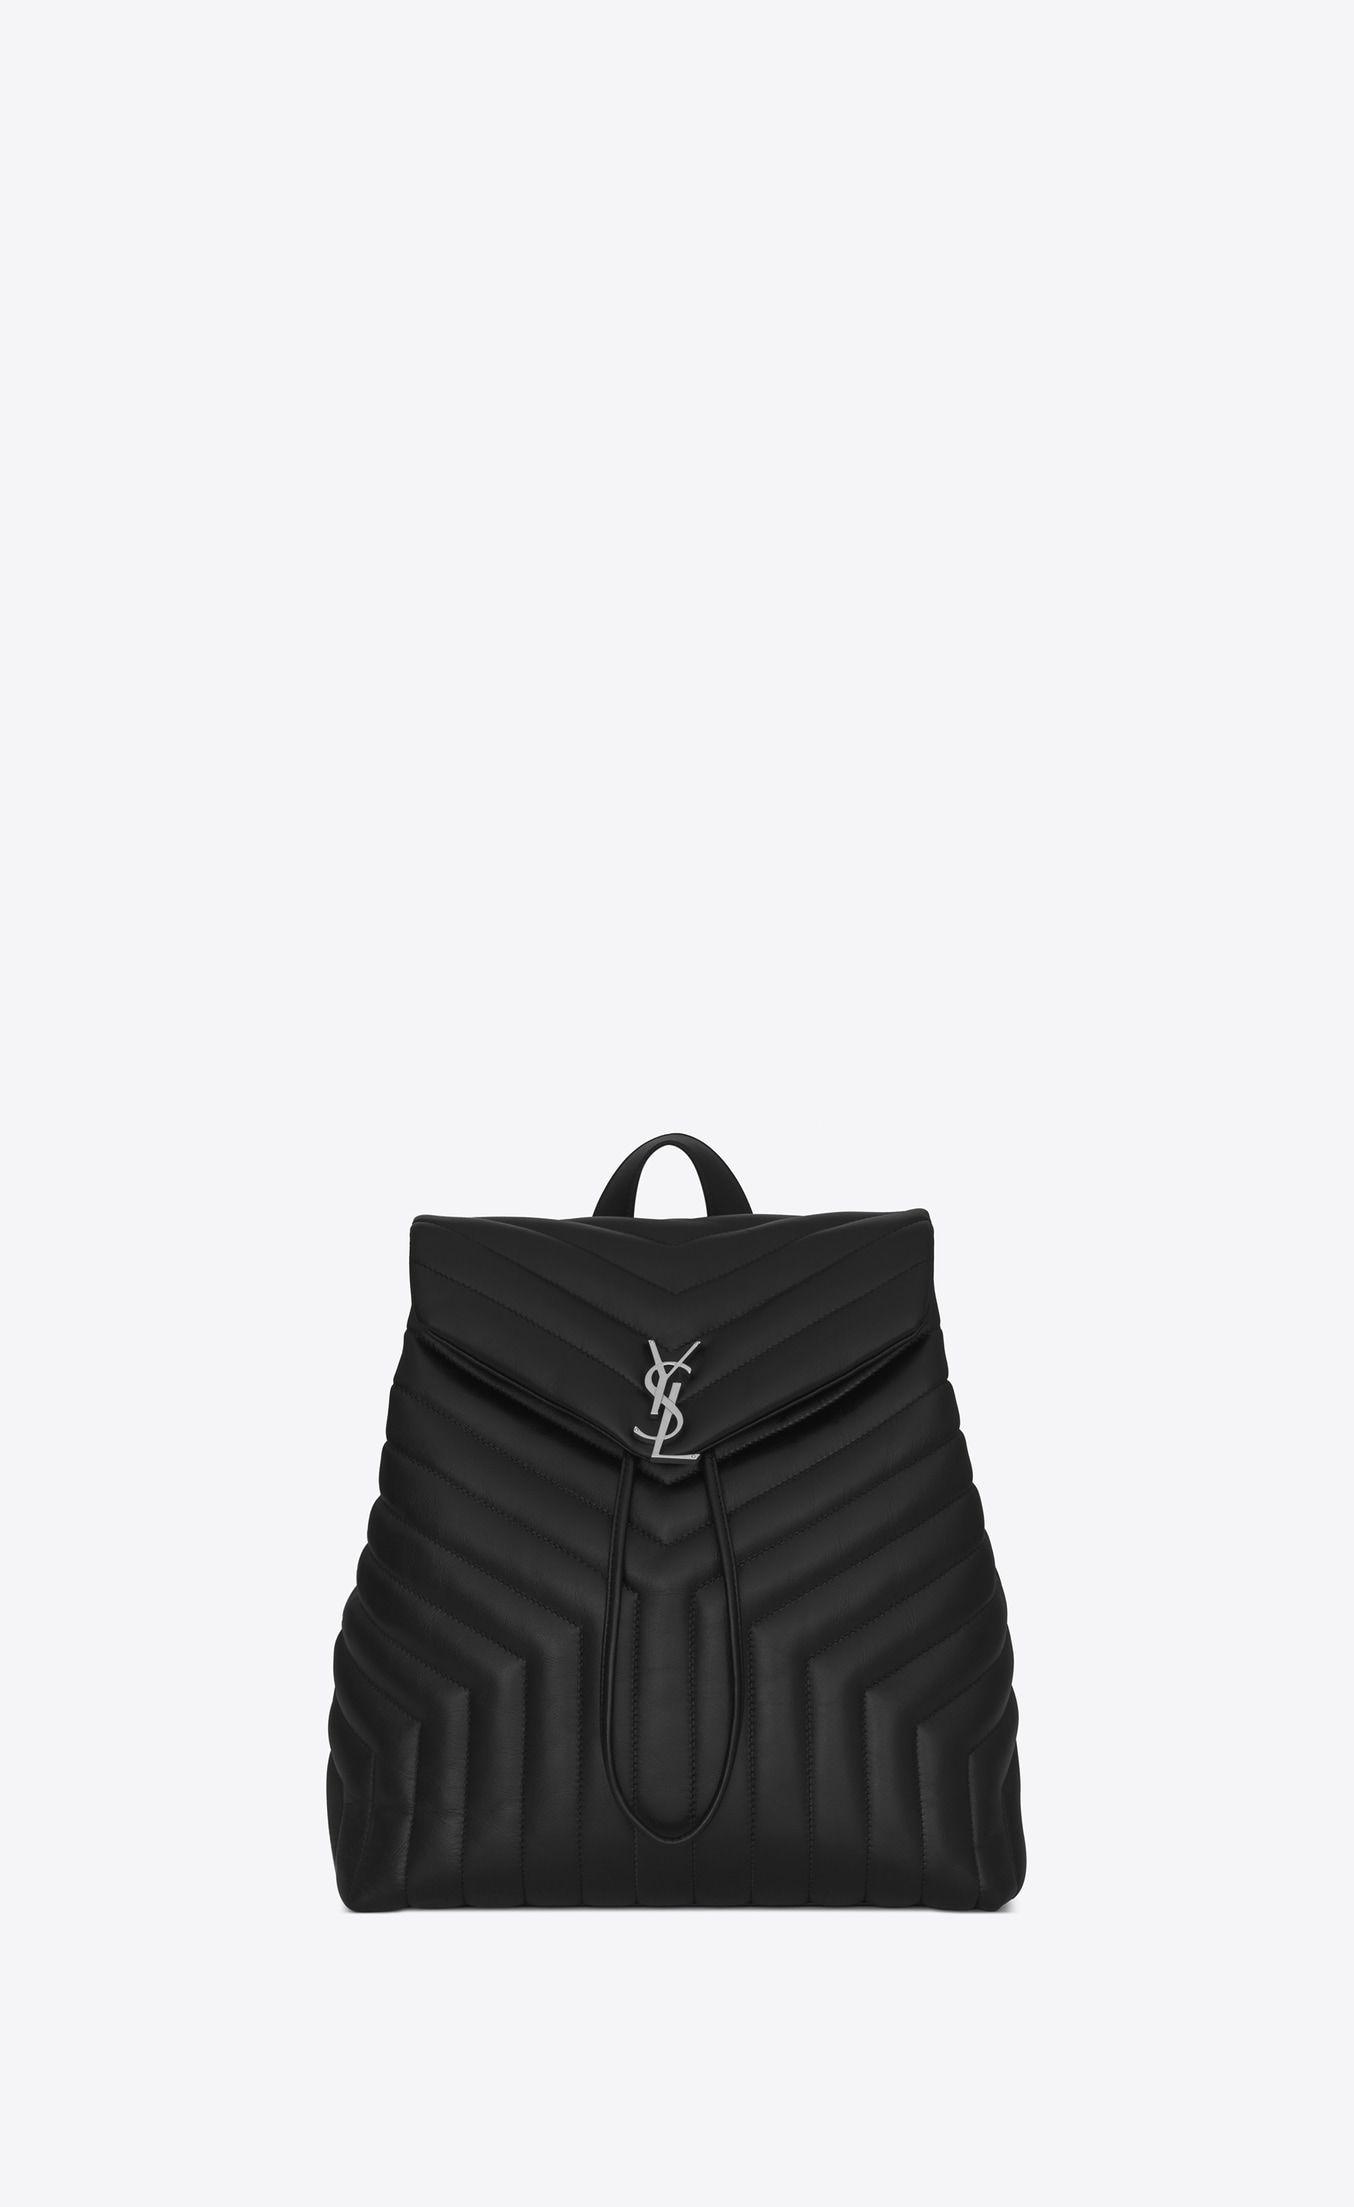 Saint Laurent Medium Loulou Monogram Backpack In Black